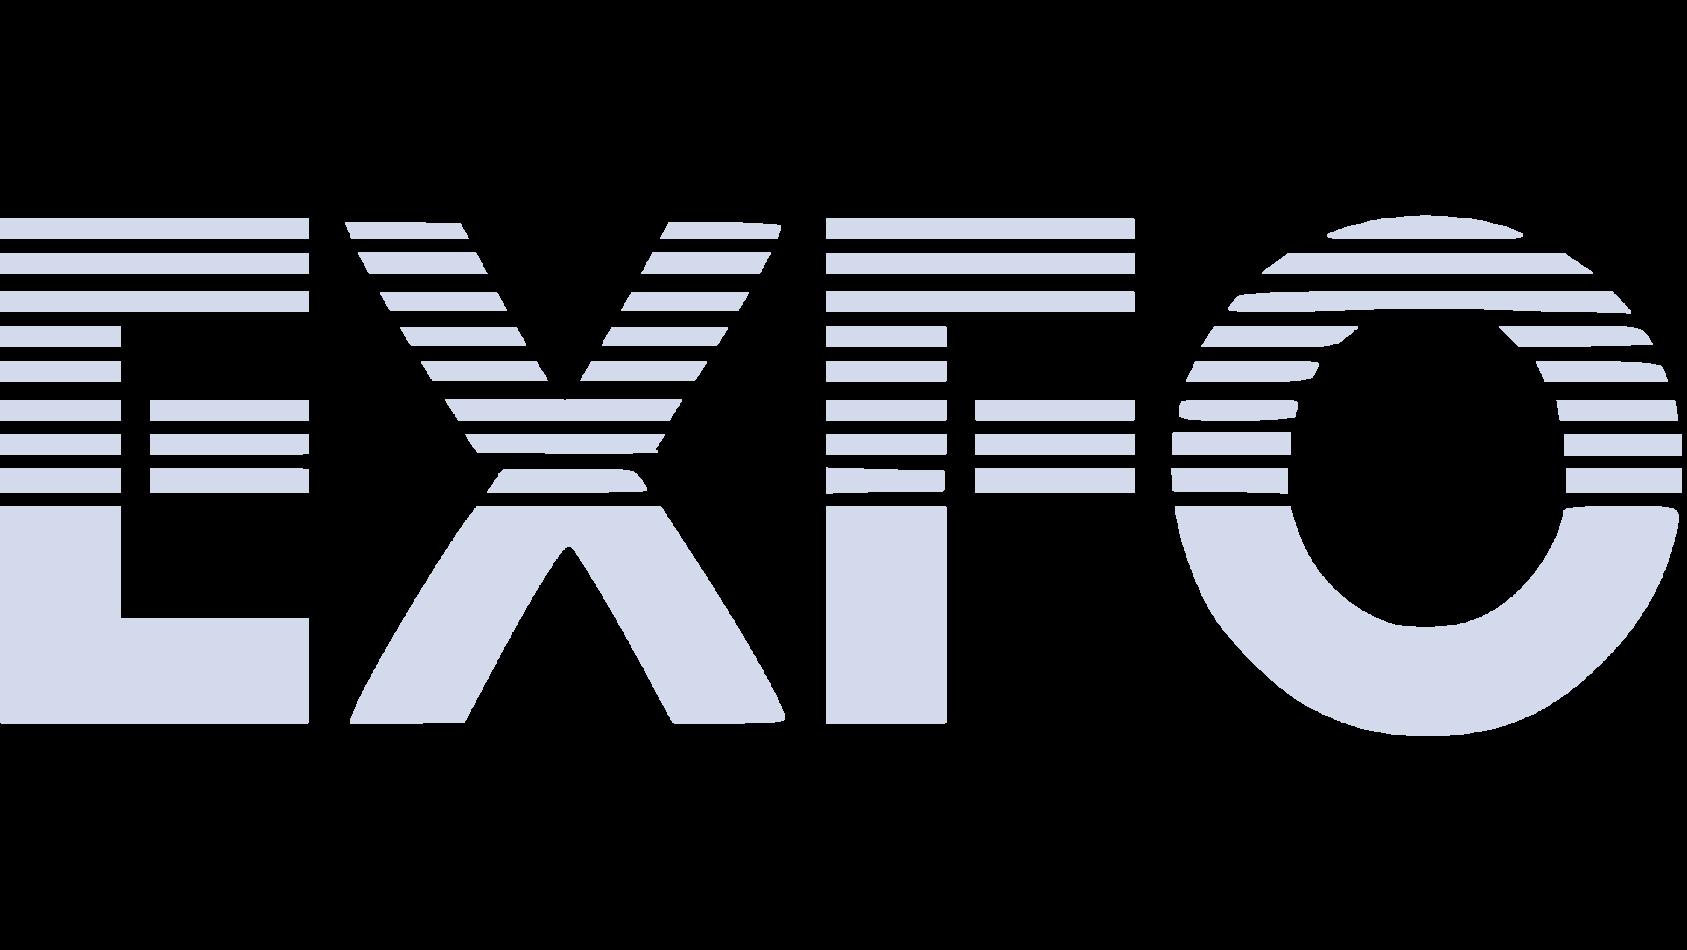 EXFO_logo.png